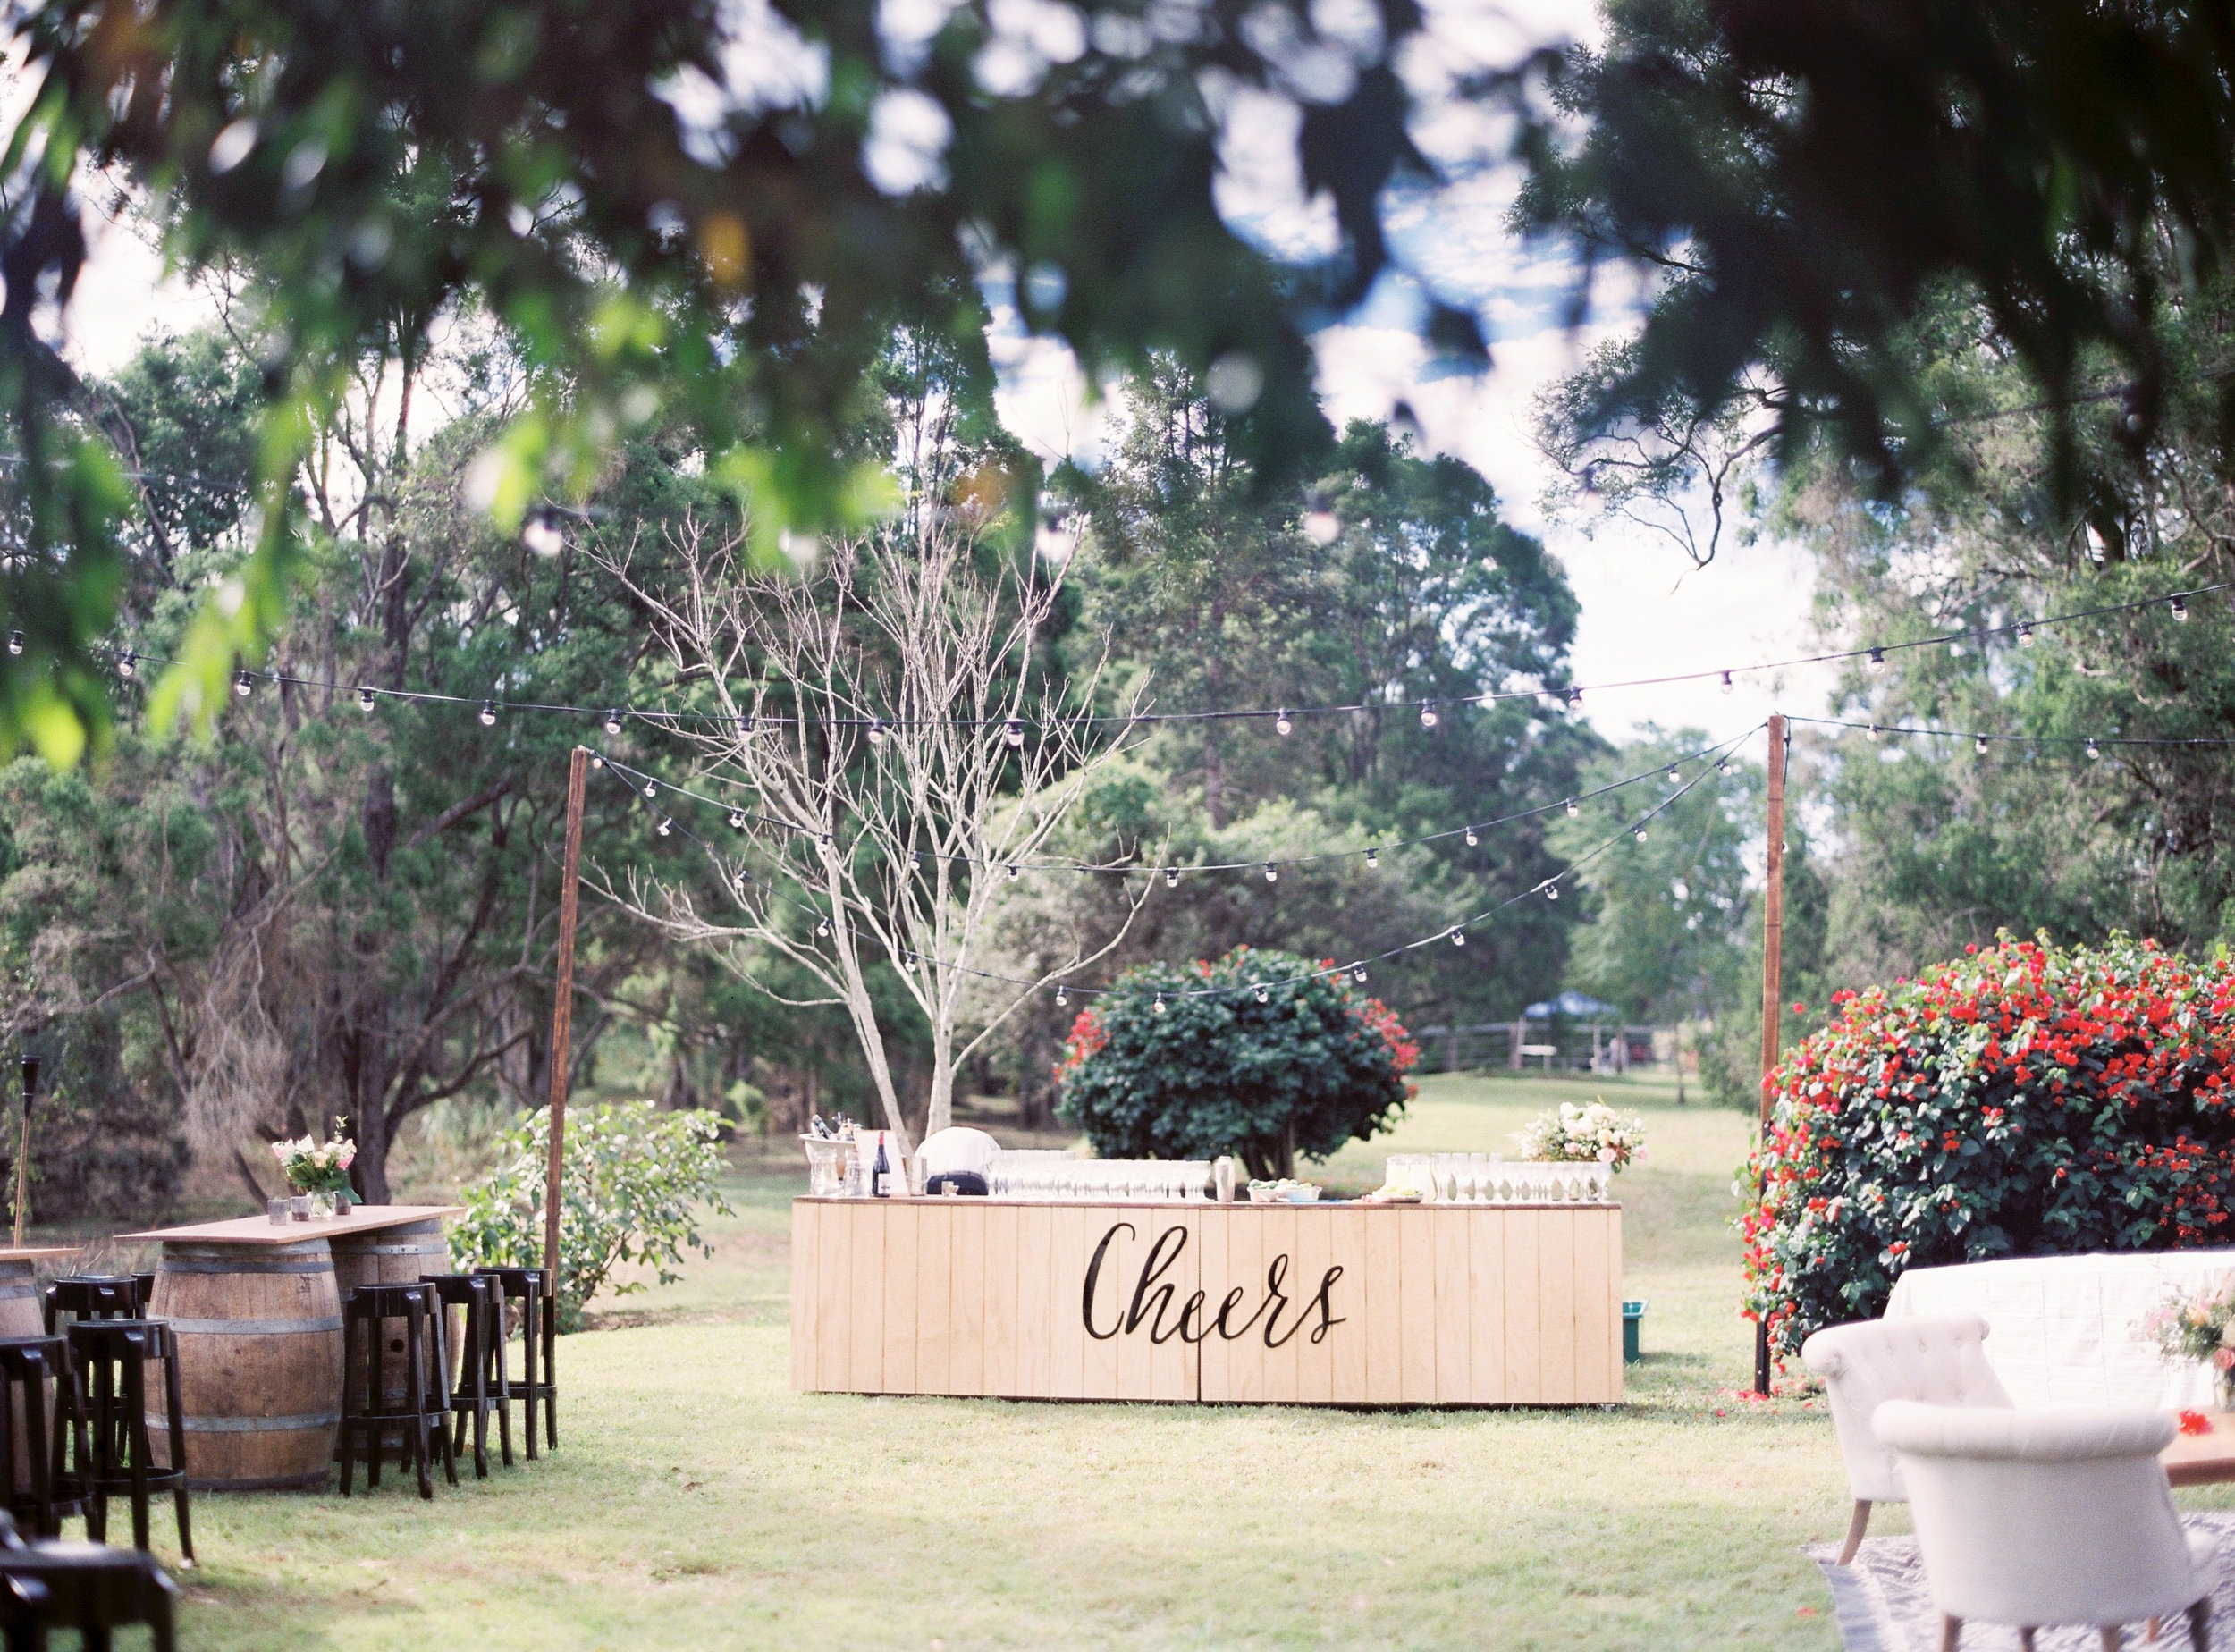 Cocktail Wedding Furniture Tips | Hampton Event Hire - Wedding & Event Hire | www.hamptoneventhire.com | Servicing Brisbane - Gold Coast - Byron Bay and beyond